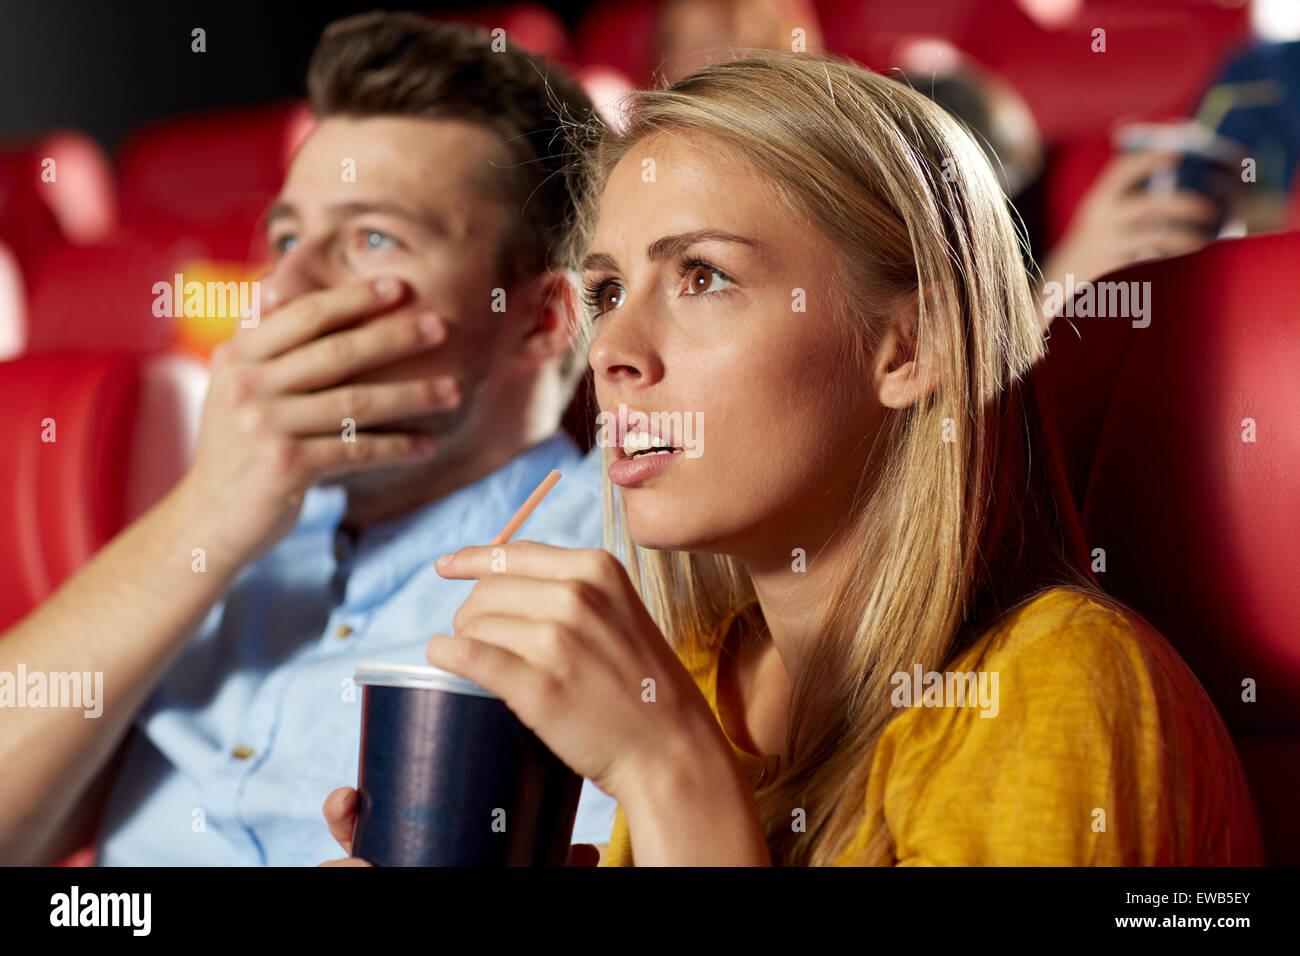 Freunde ich Horrorfilm im theater Stockbild